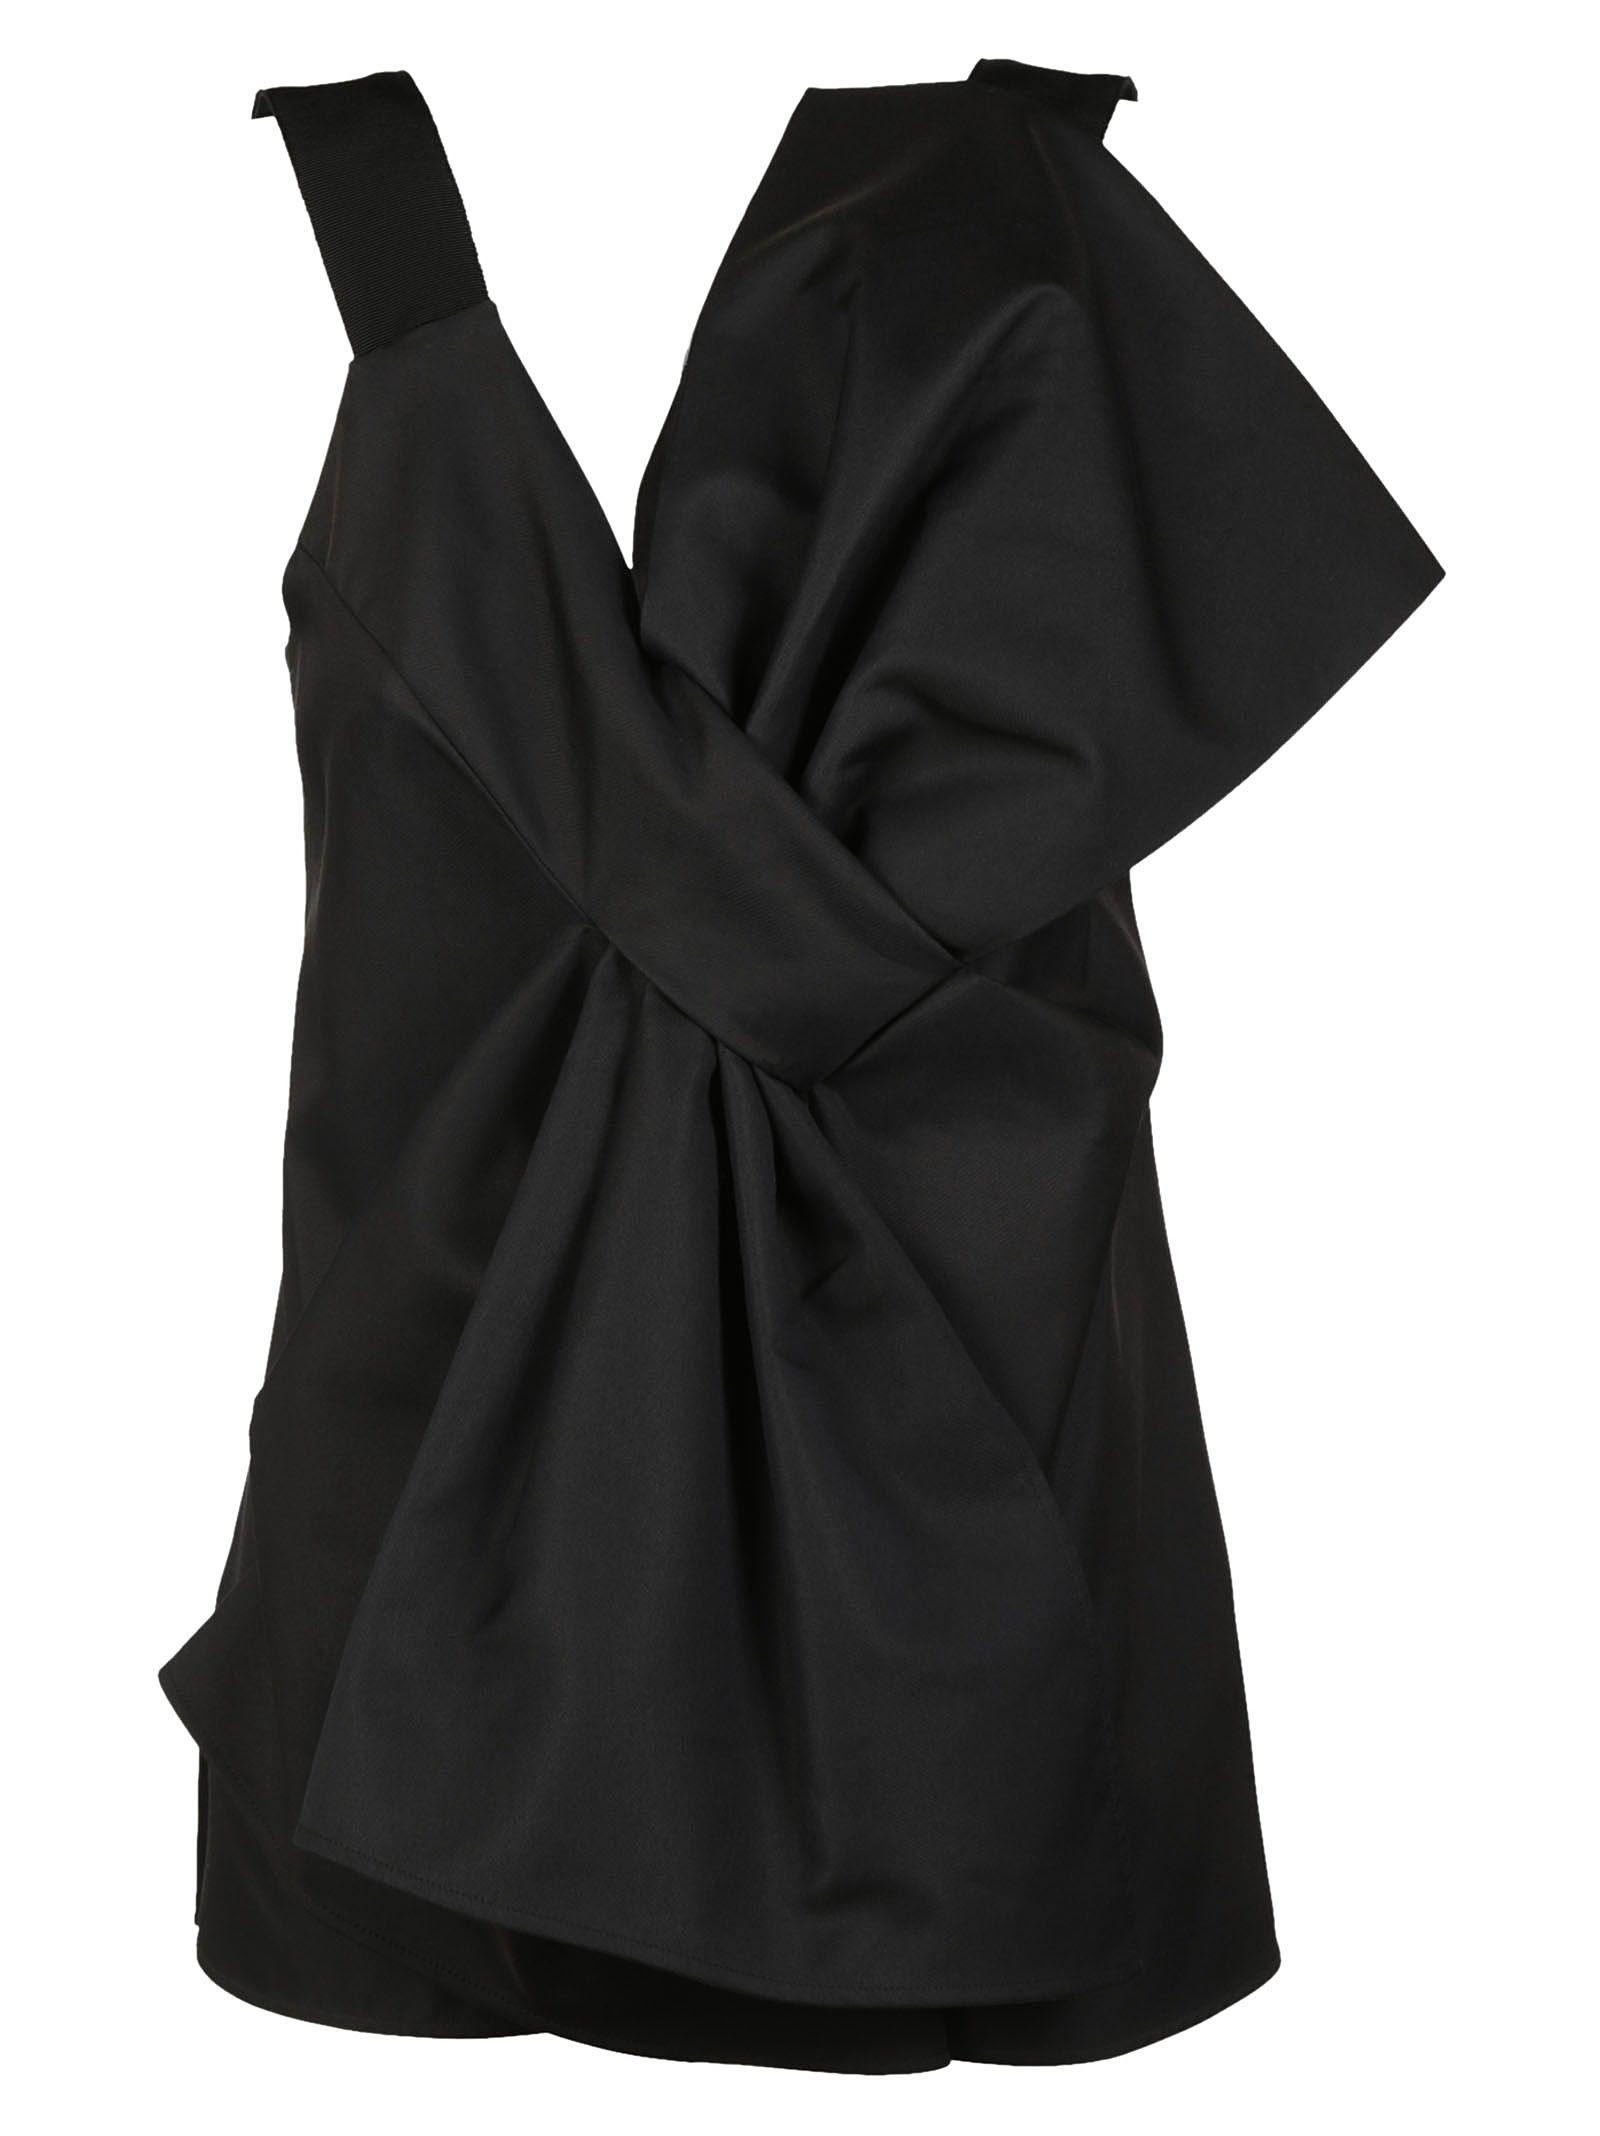 Victoria Beckham Asymmetric Bow Top